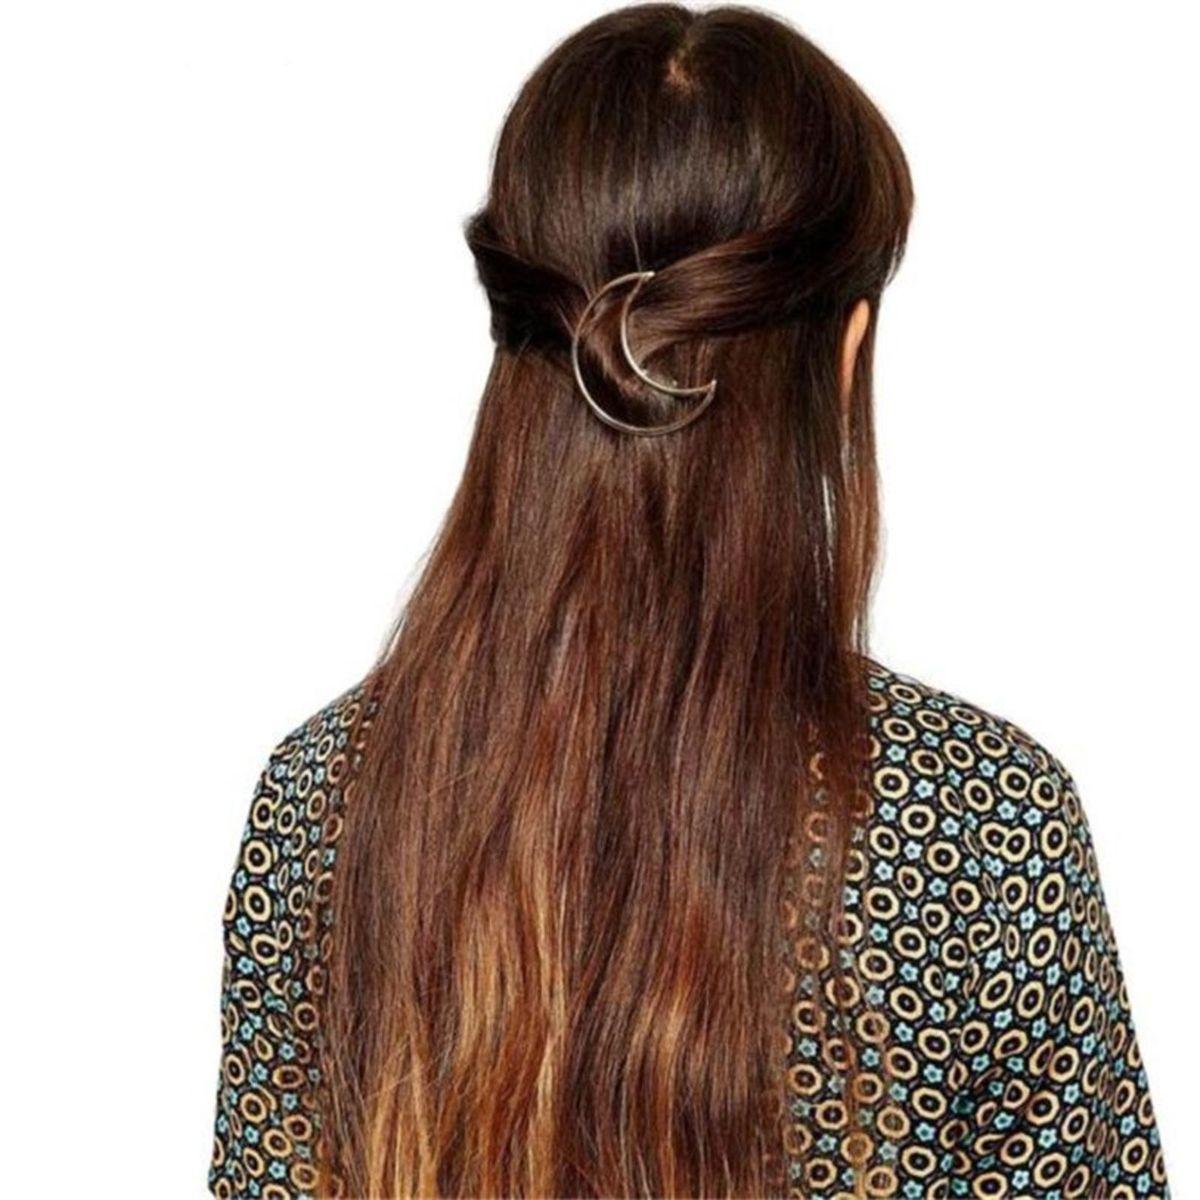 clip presilha grampo tic tac lua - cabelos sem marca